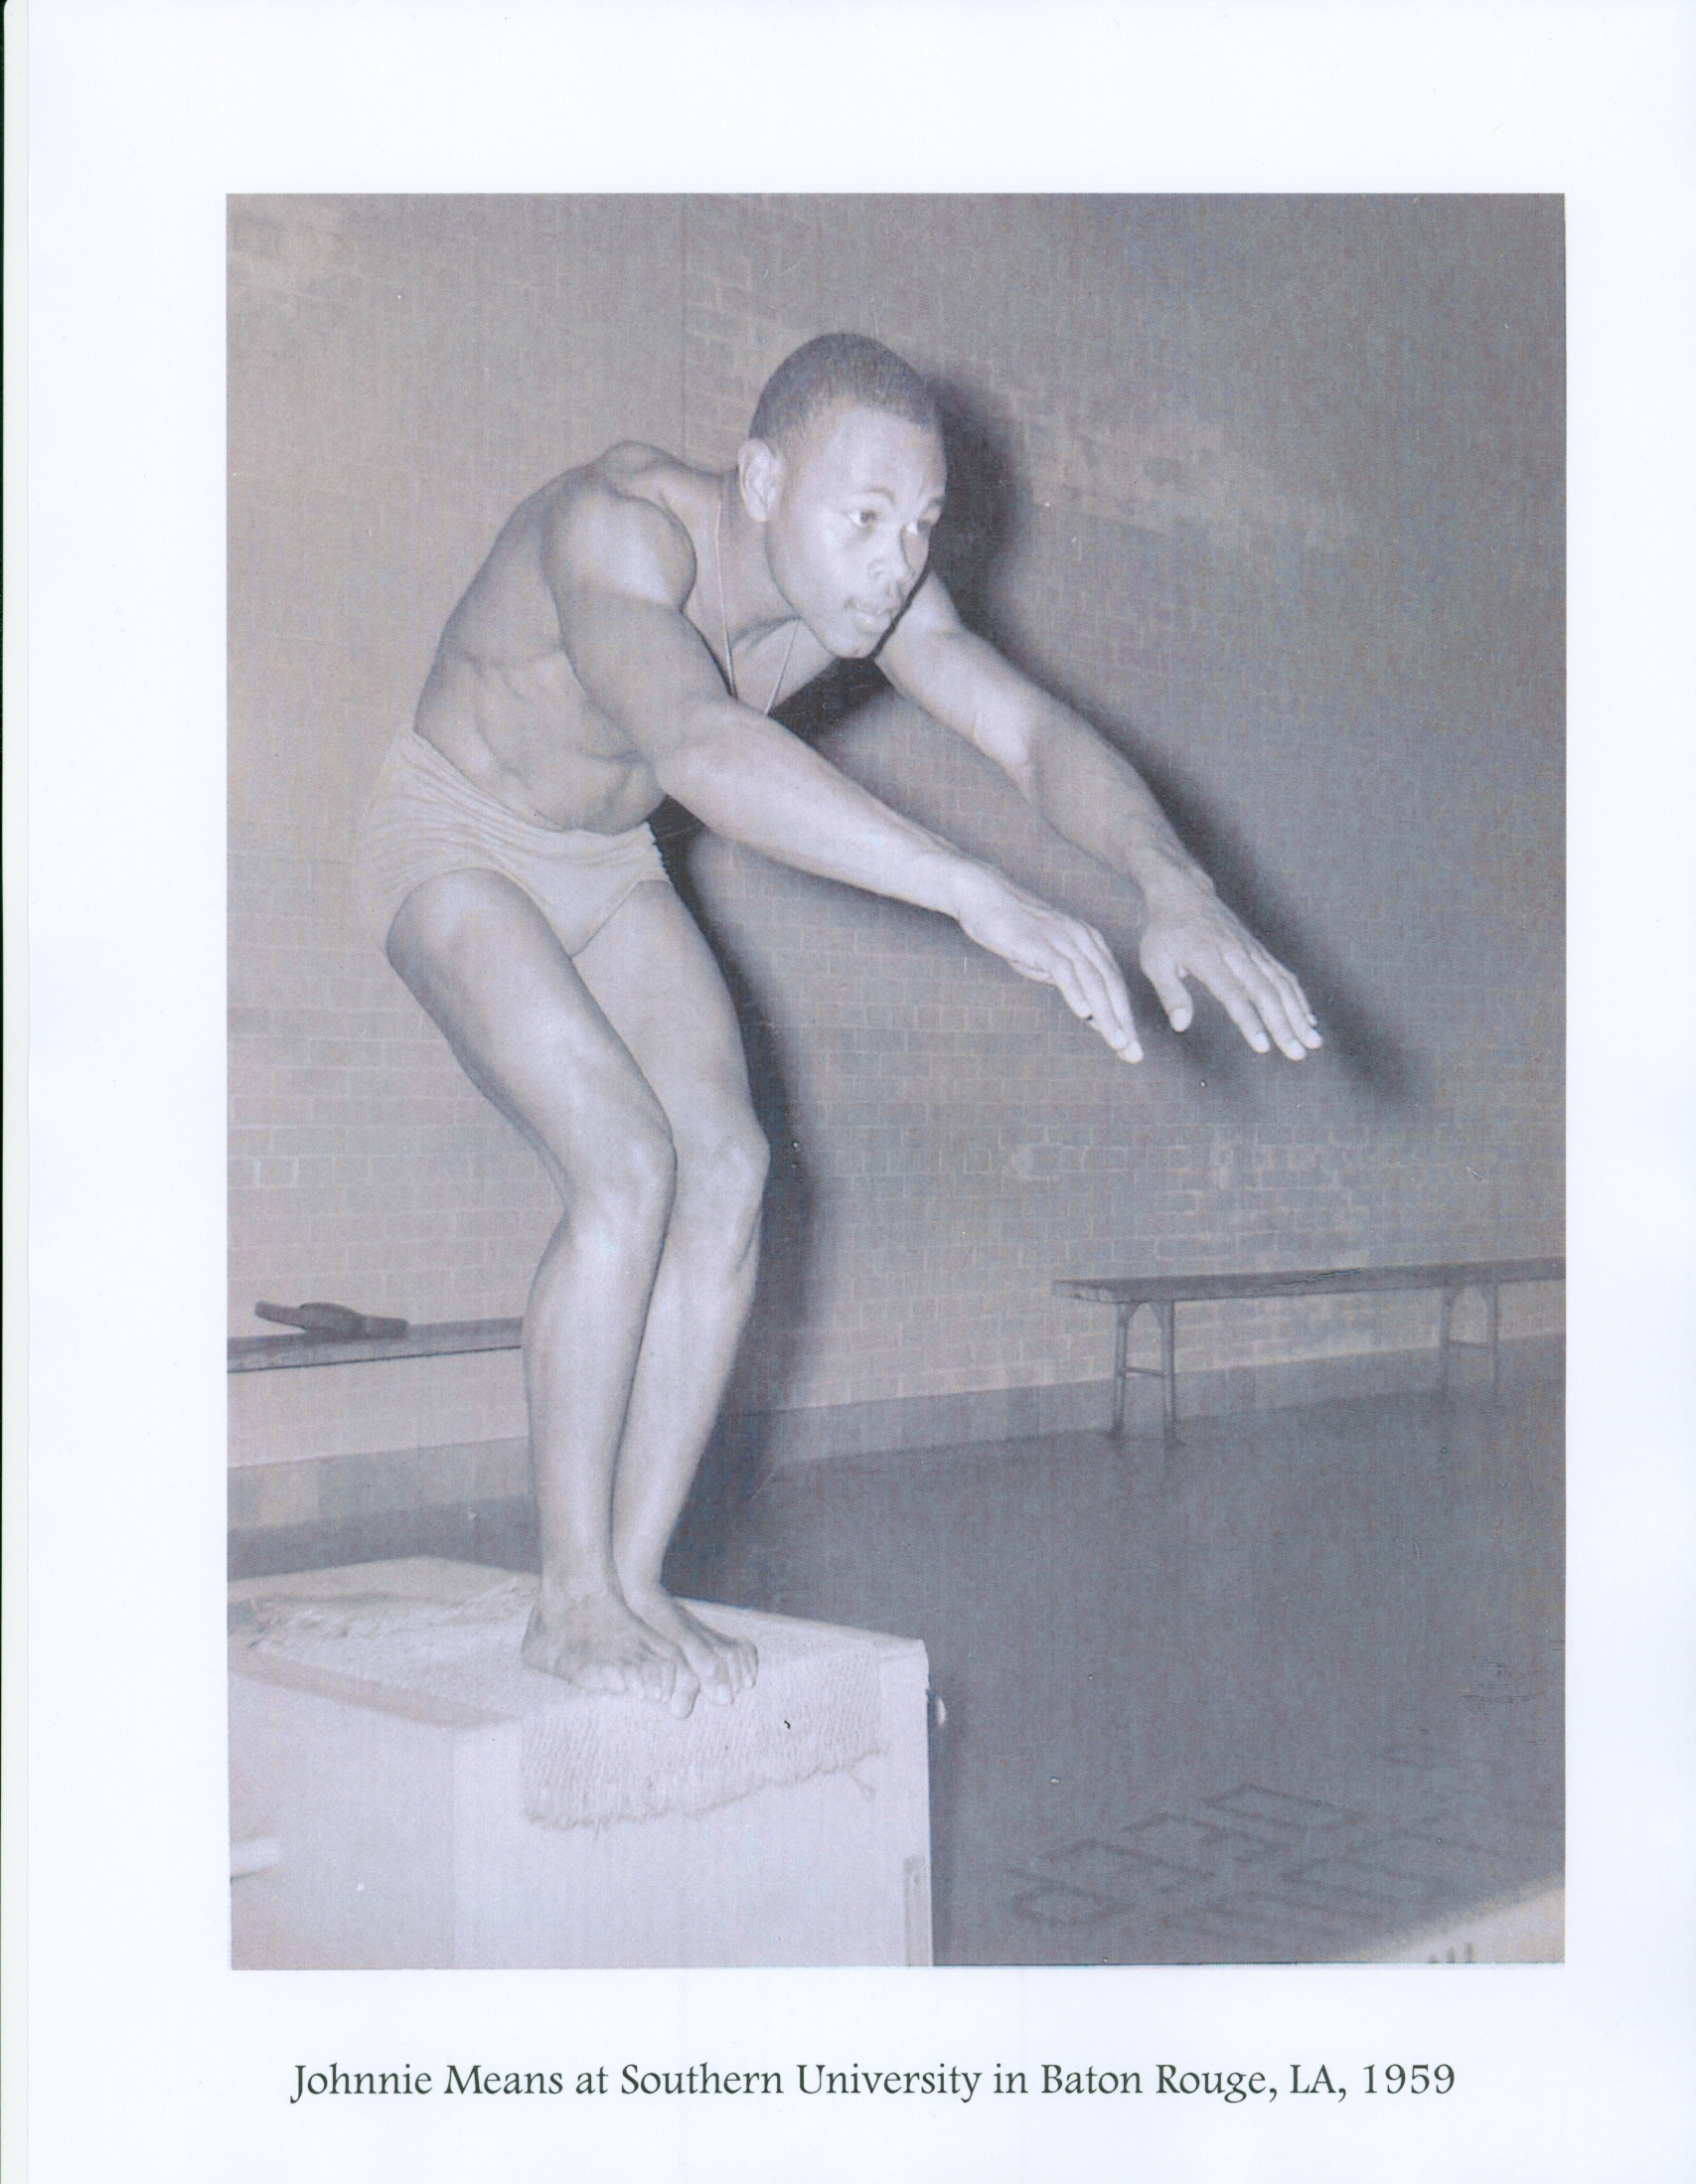 JM diving picture.jpg